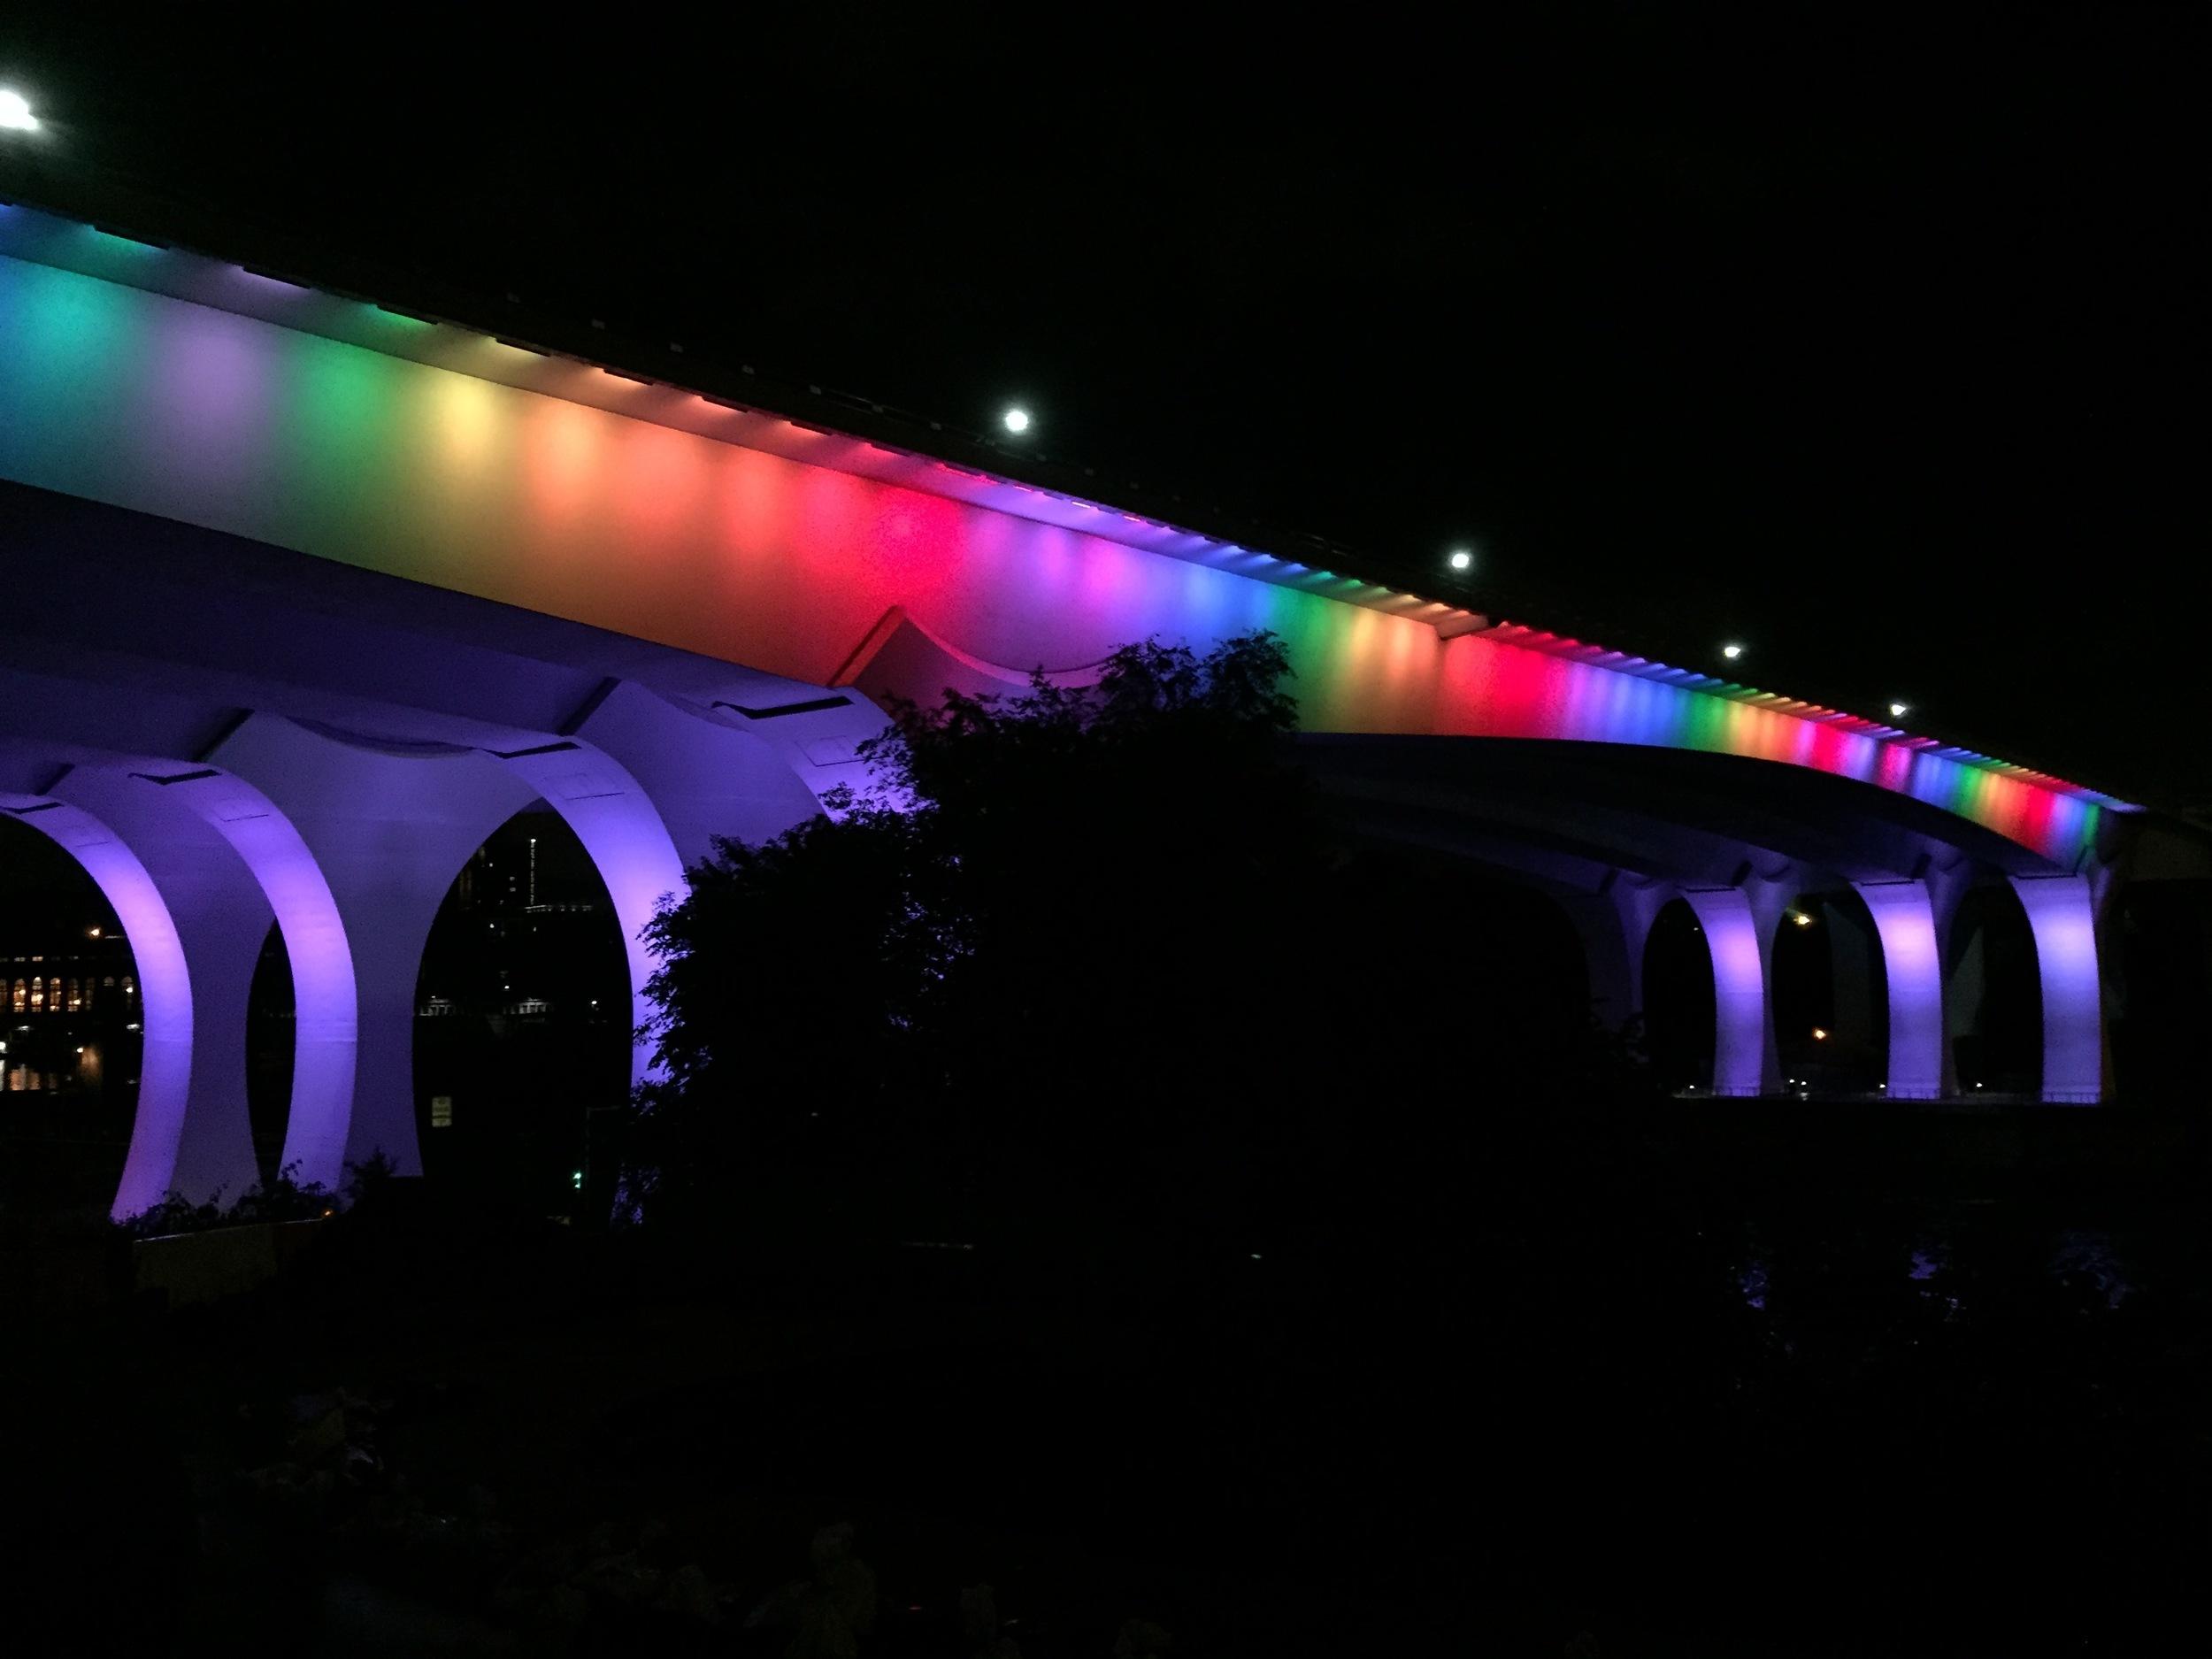 I-35W Bridge in Minneapolis, Minnesota - A tribute to the Orlando Shooting